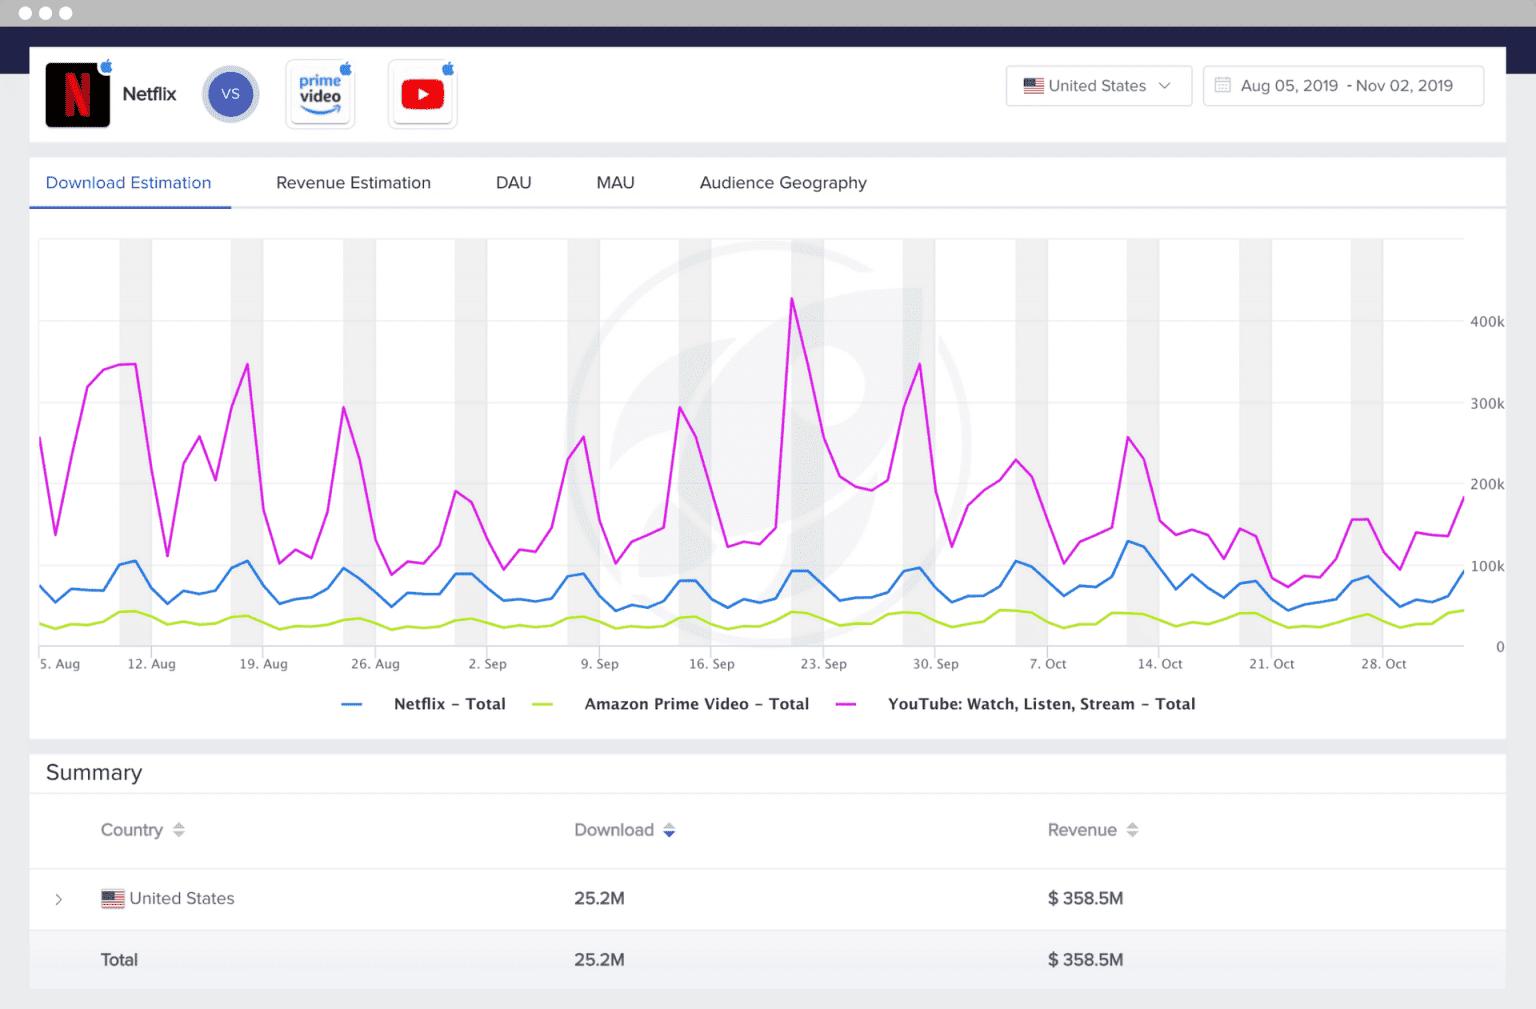 mobileaction app download revenue usage estimates data graph